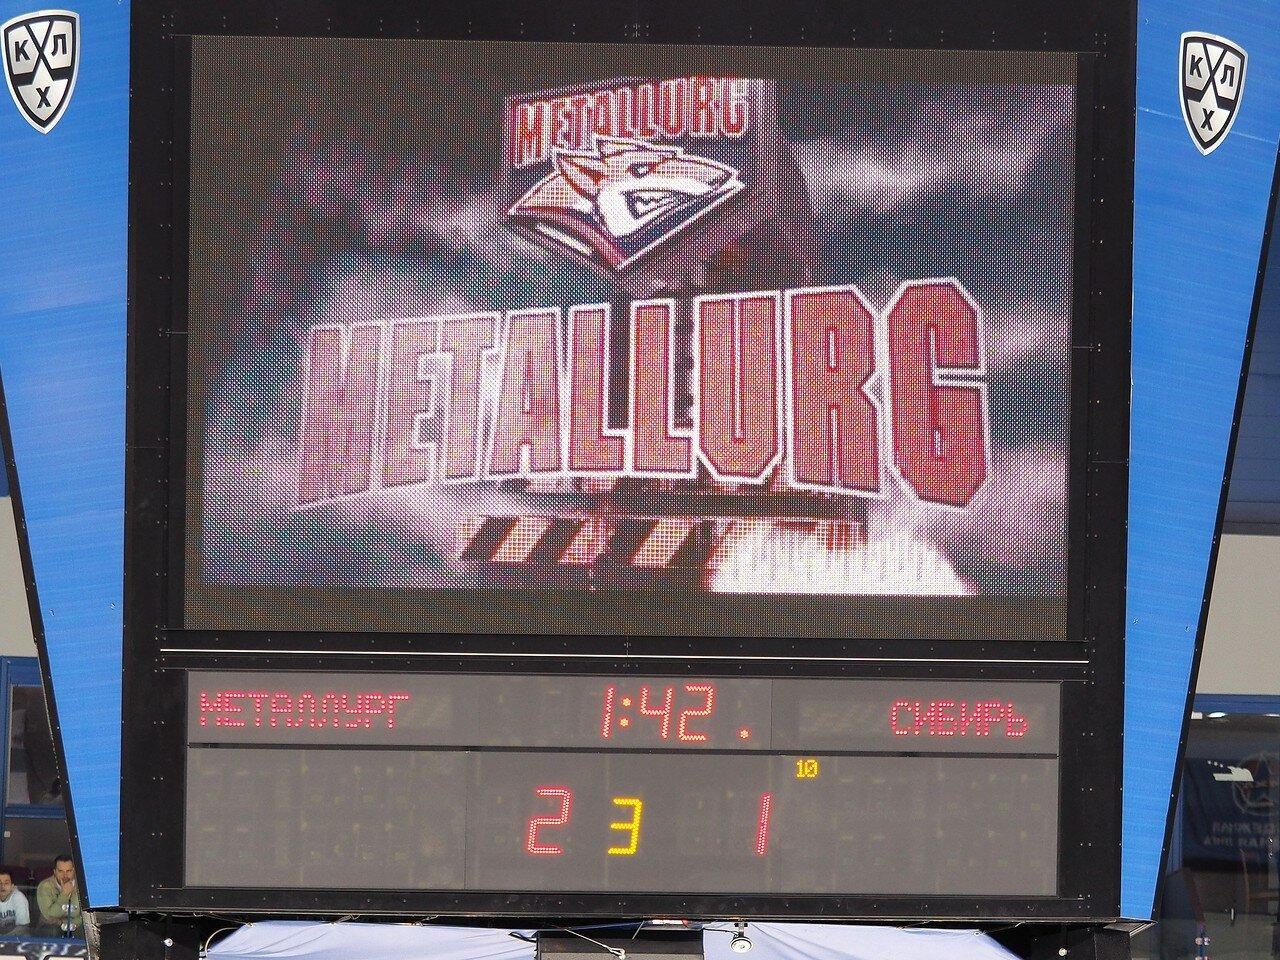 121Восток 1/2 плей-офф Металлург - Сибирь 08.03.2016